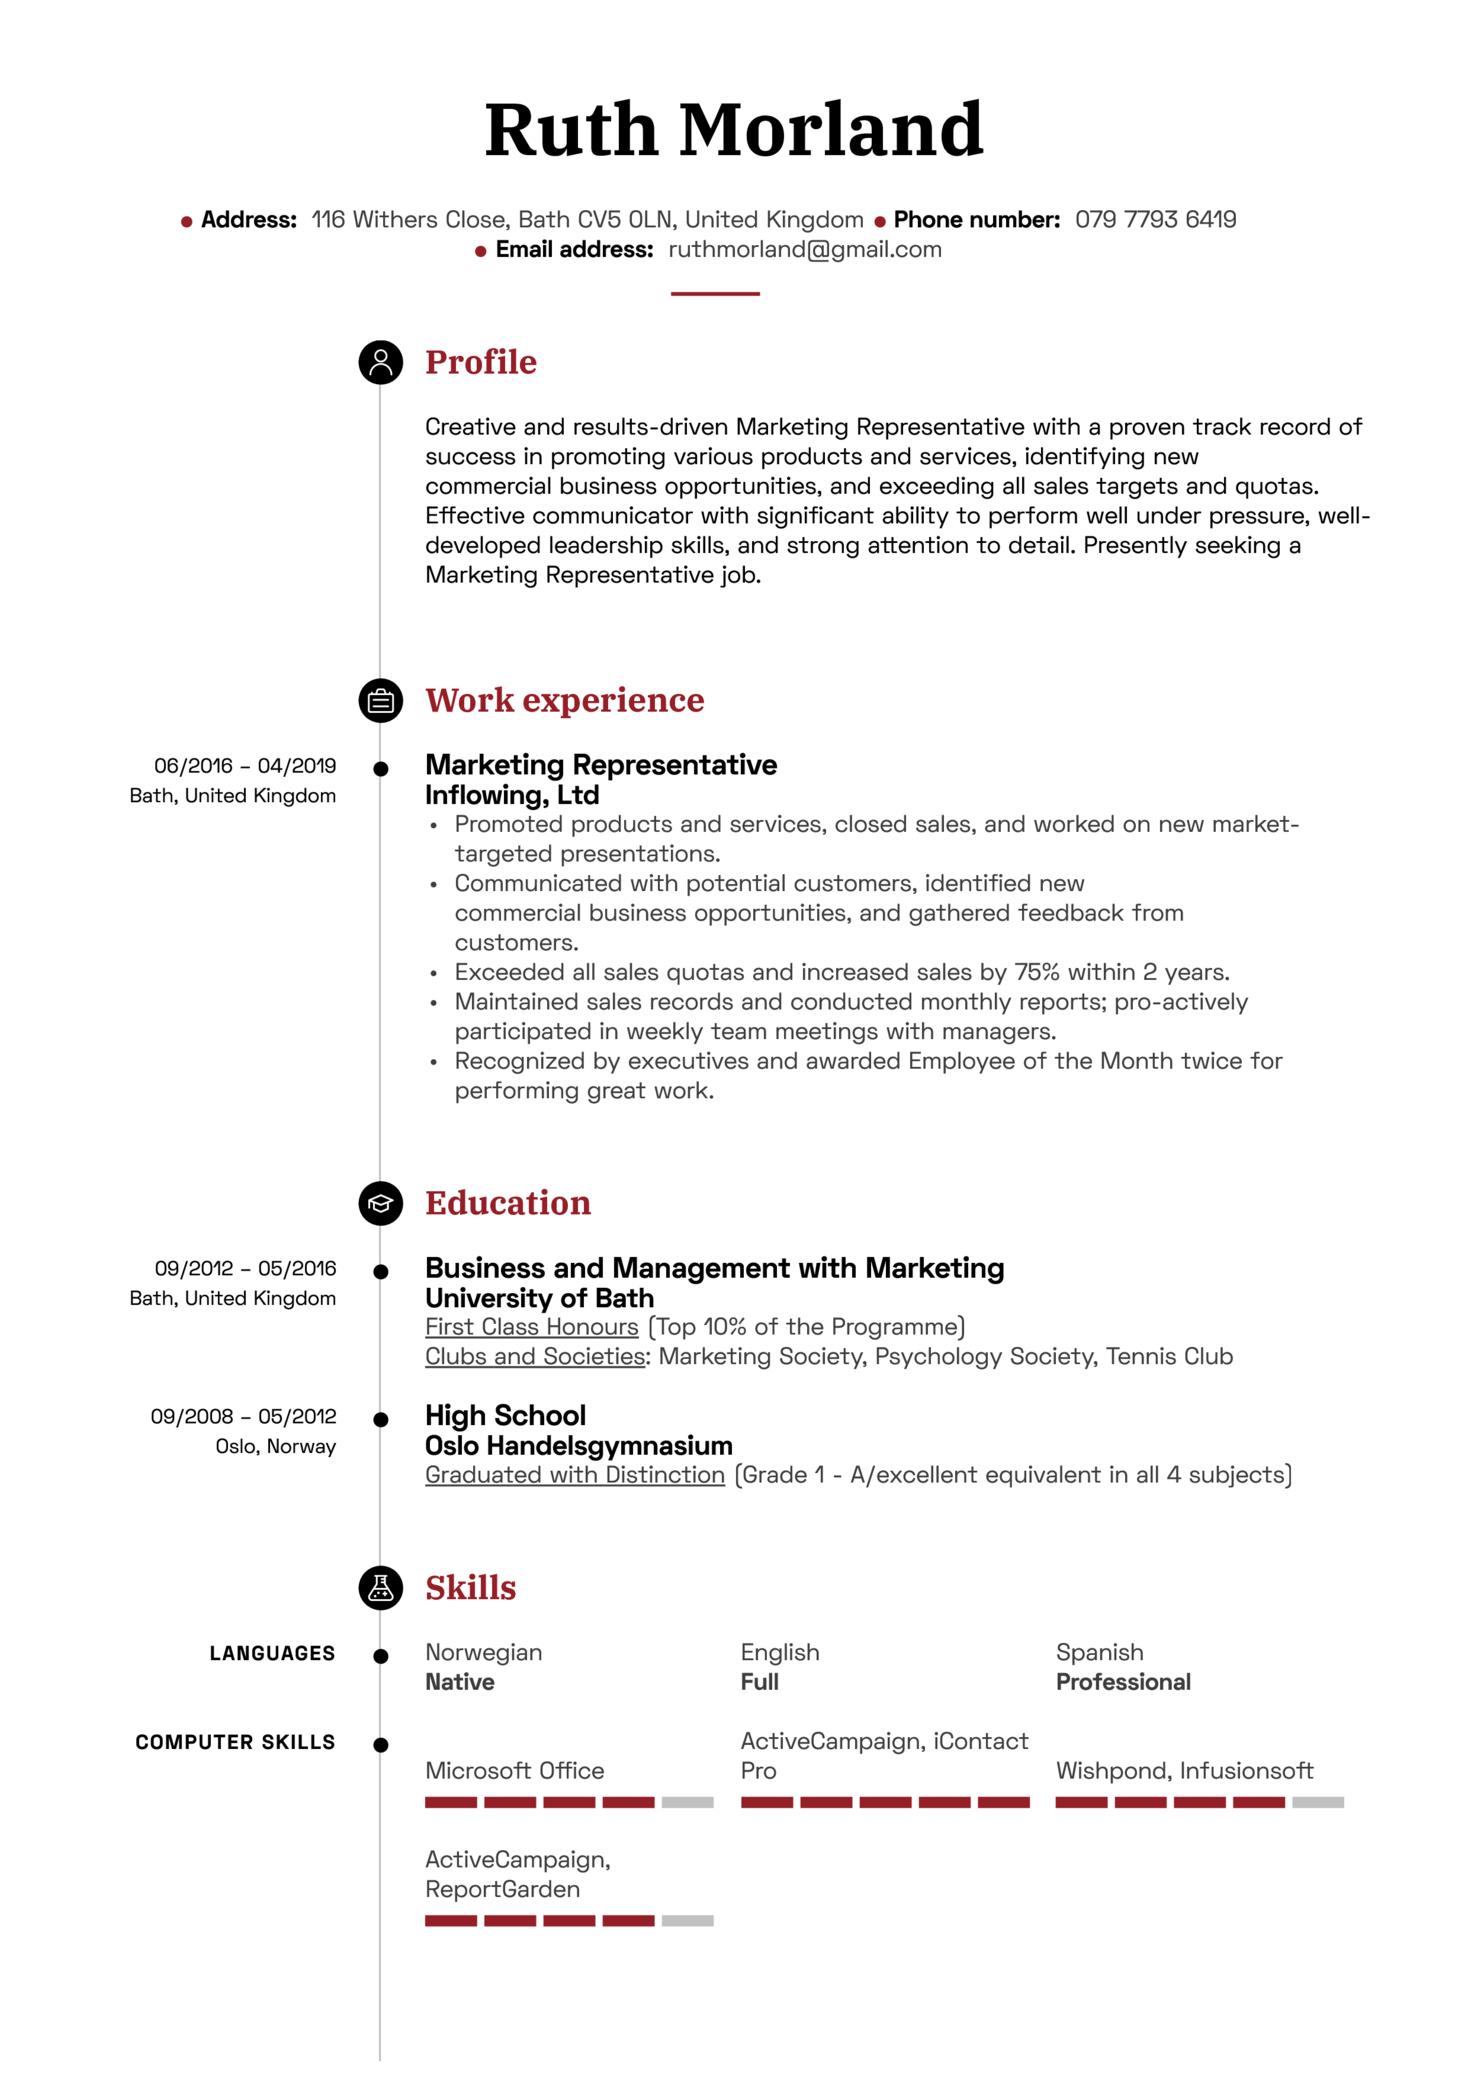 Marketing Representative Resume Sample (parte 1)